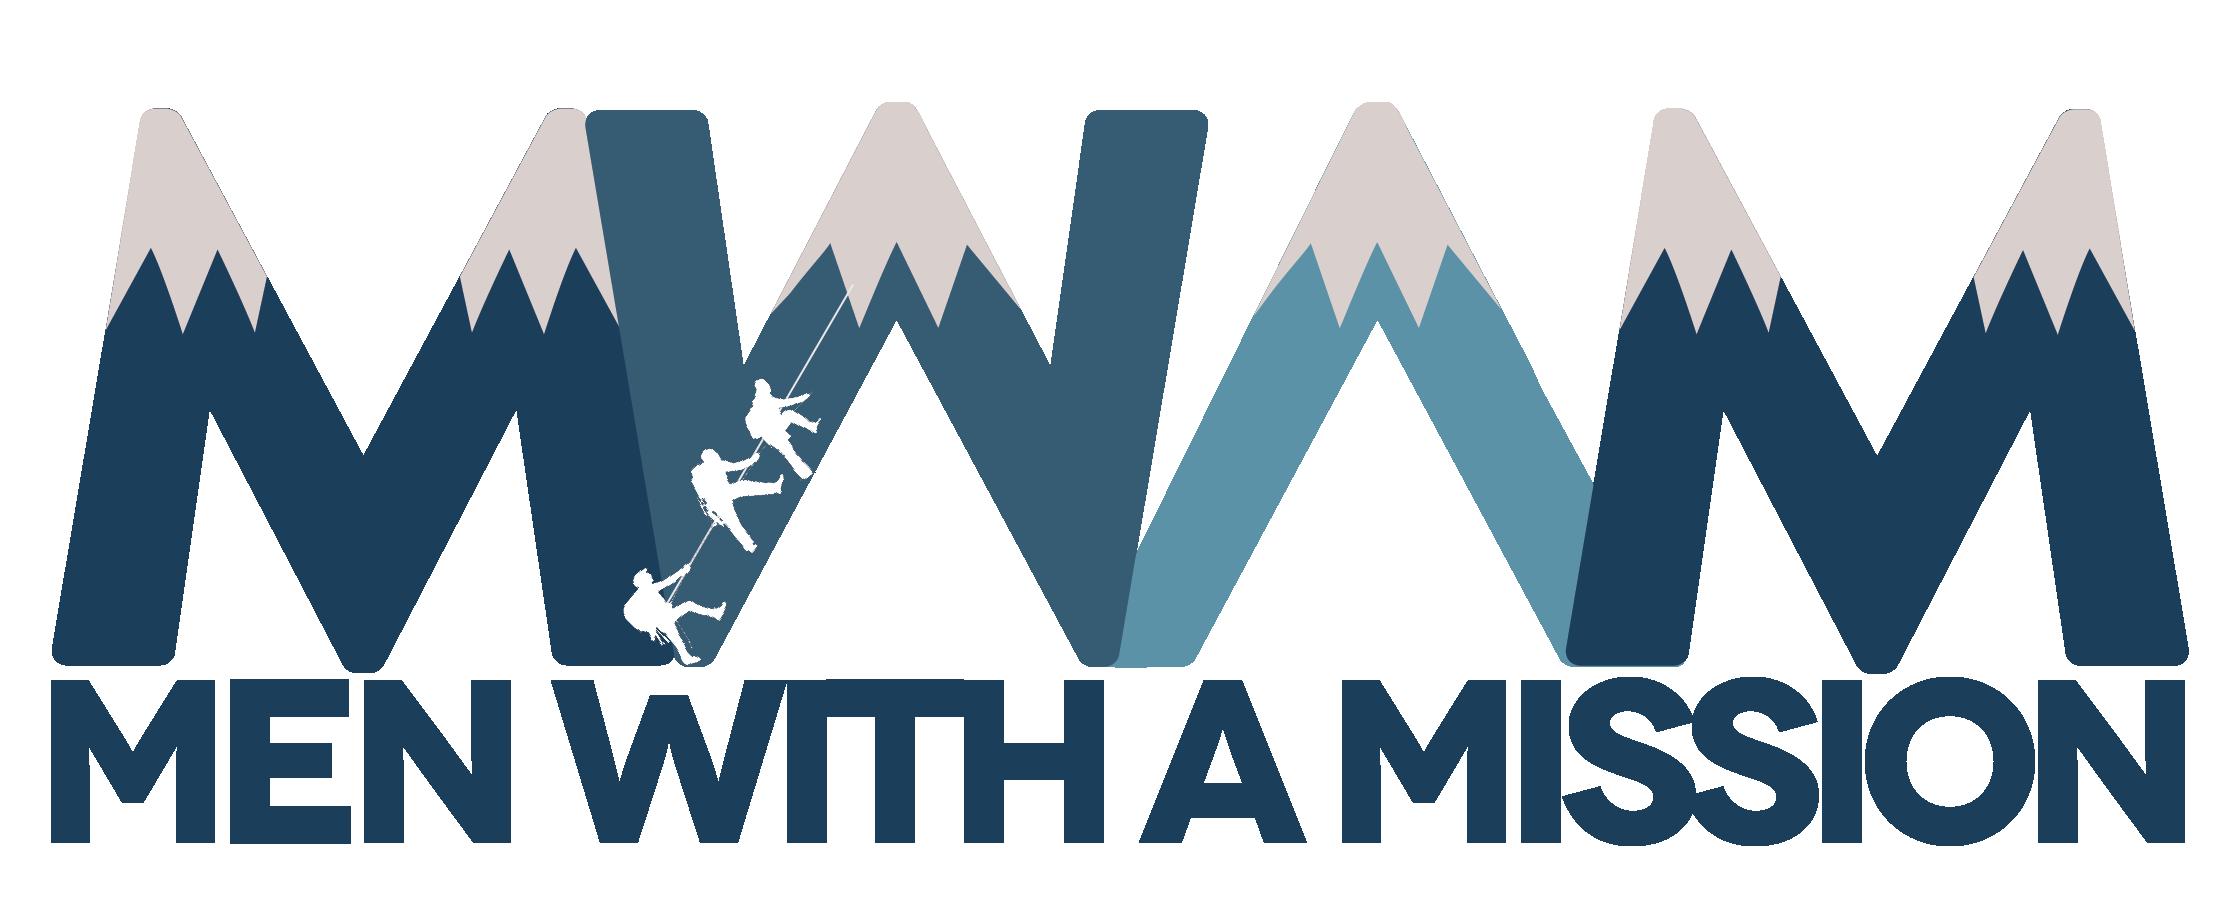 160518 MWAM Logo-04.png